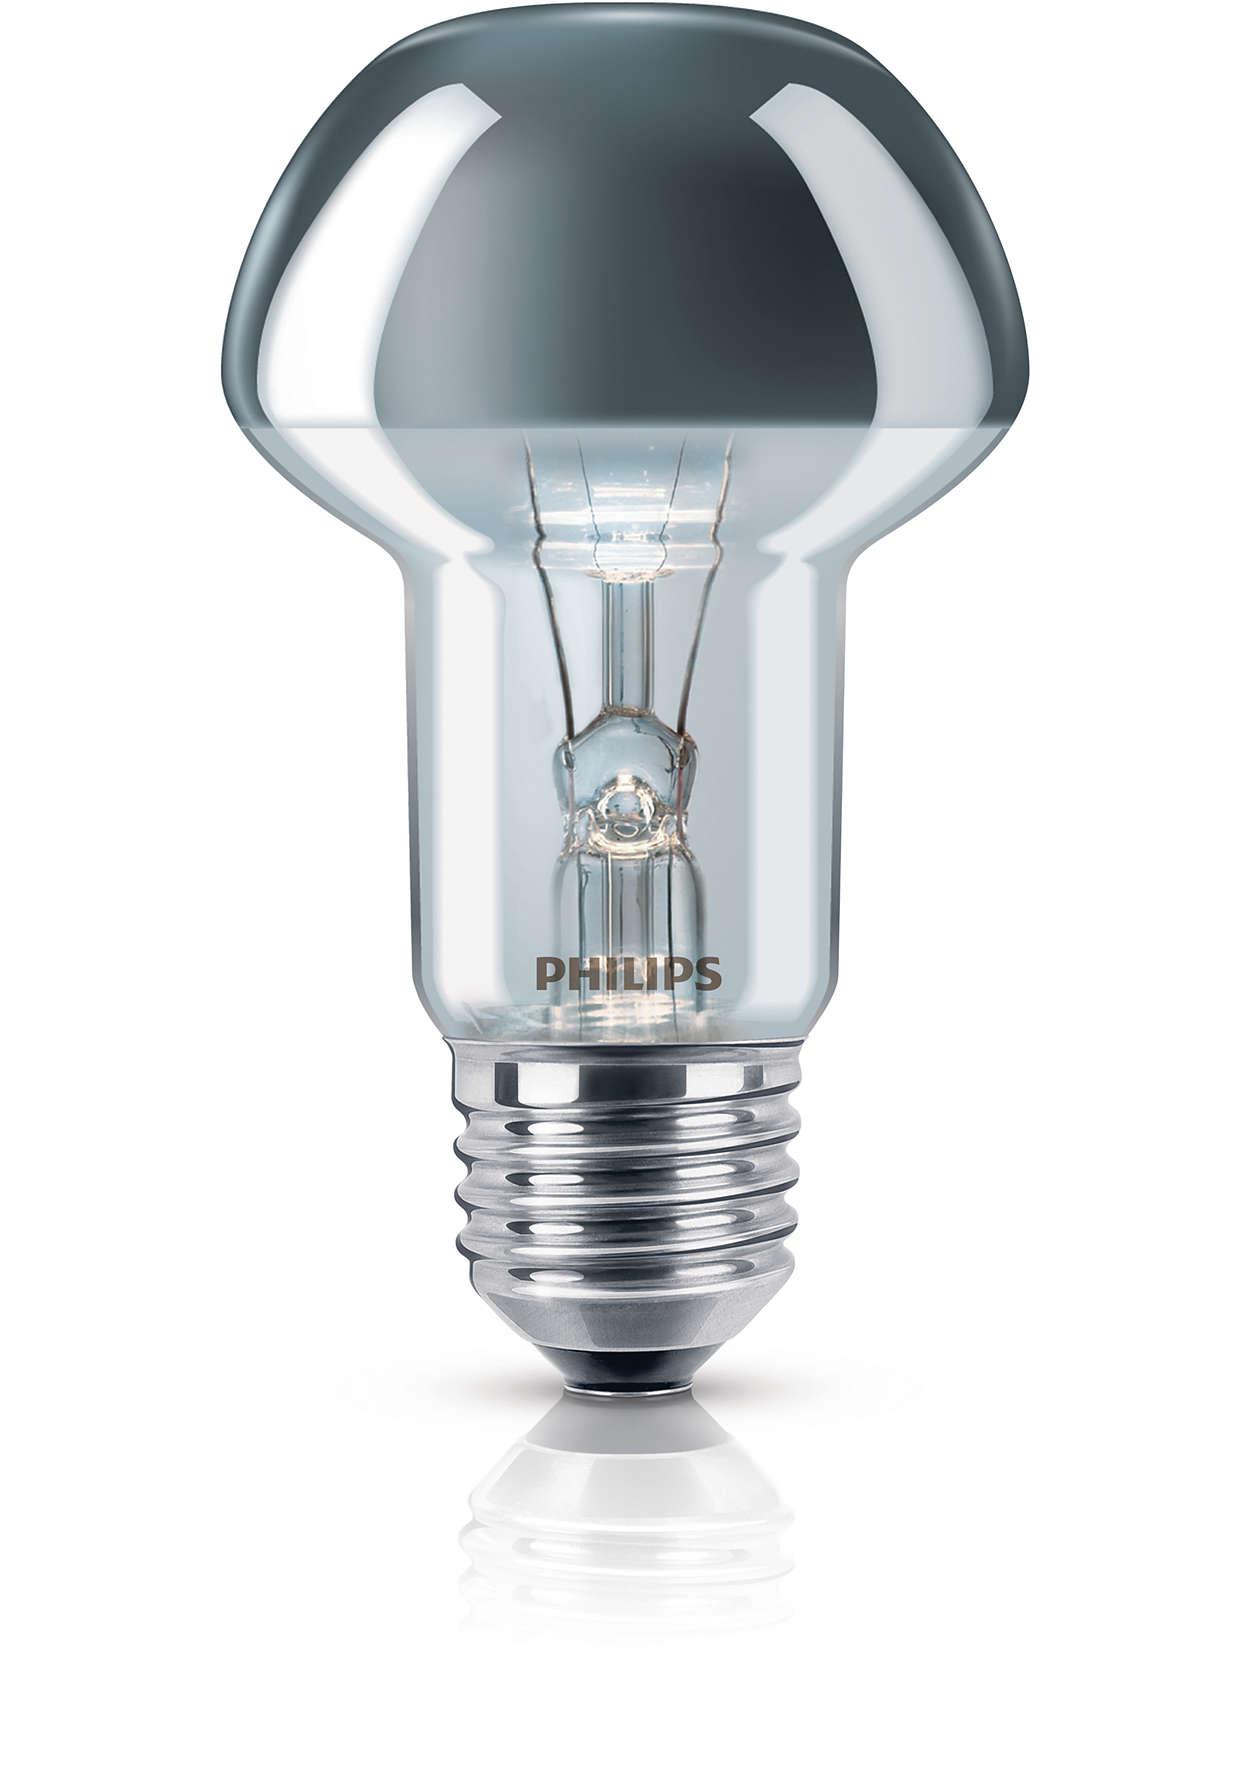 incandescent reflector lamp gloeilamp reflector 8711500054326 philips. Black Bedroom Furniture Sets. Home Design Ideas